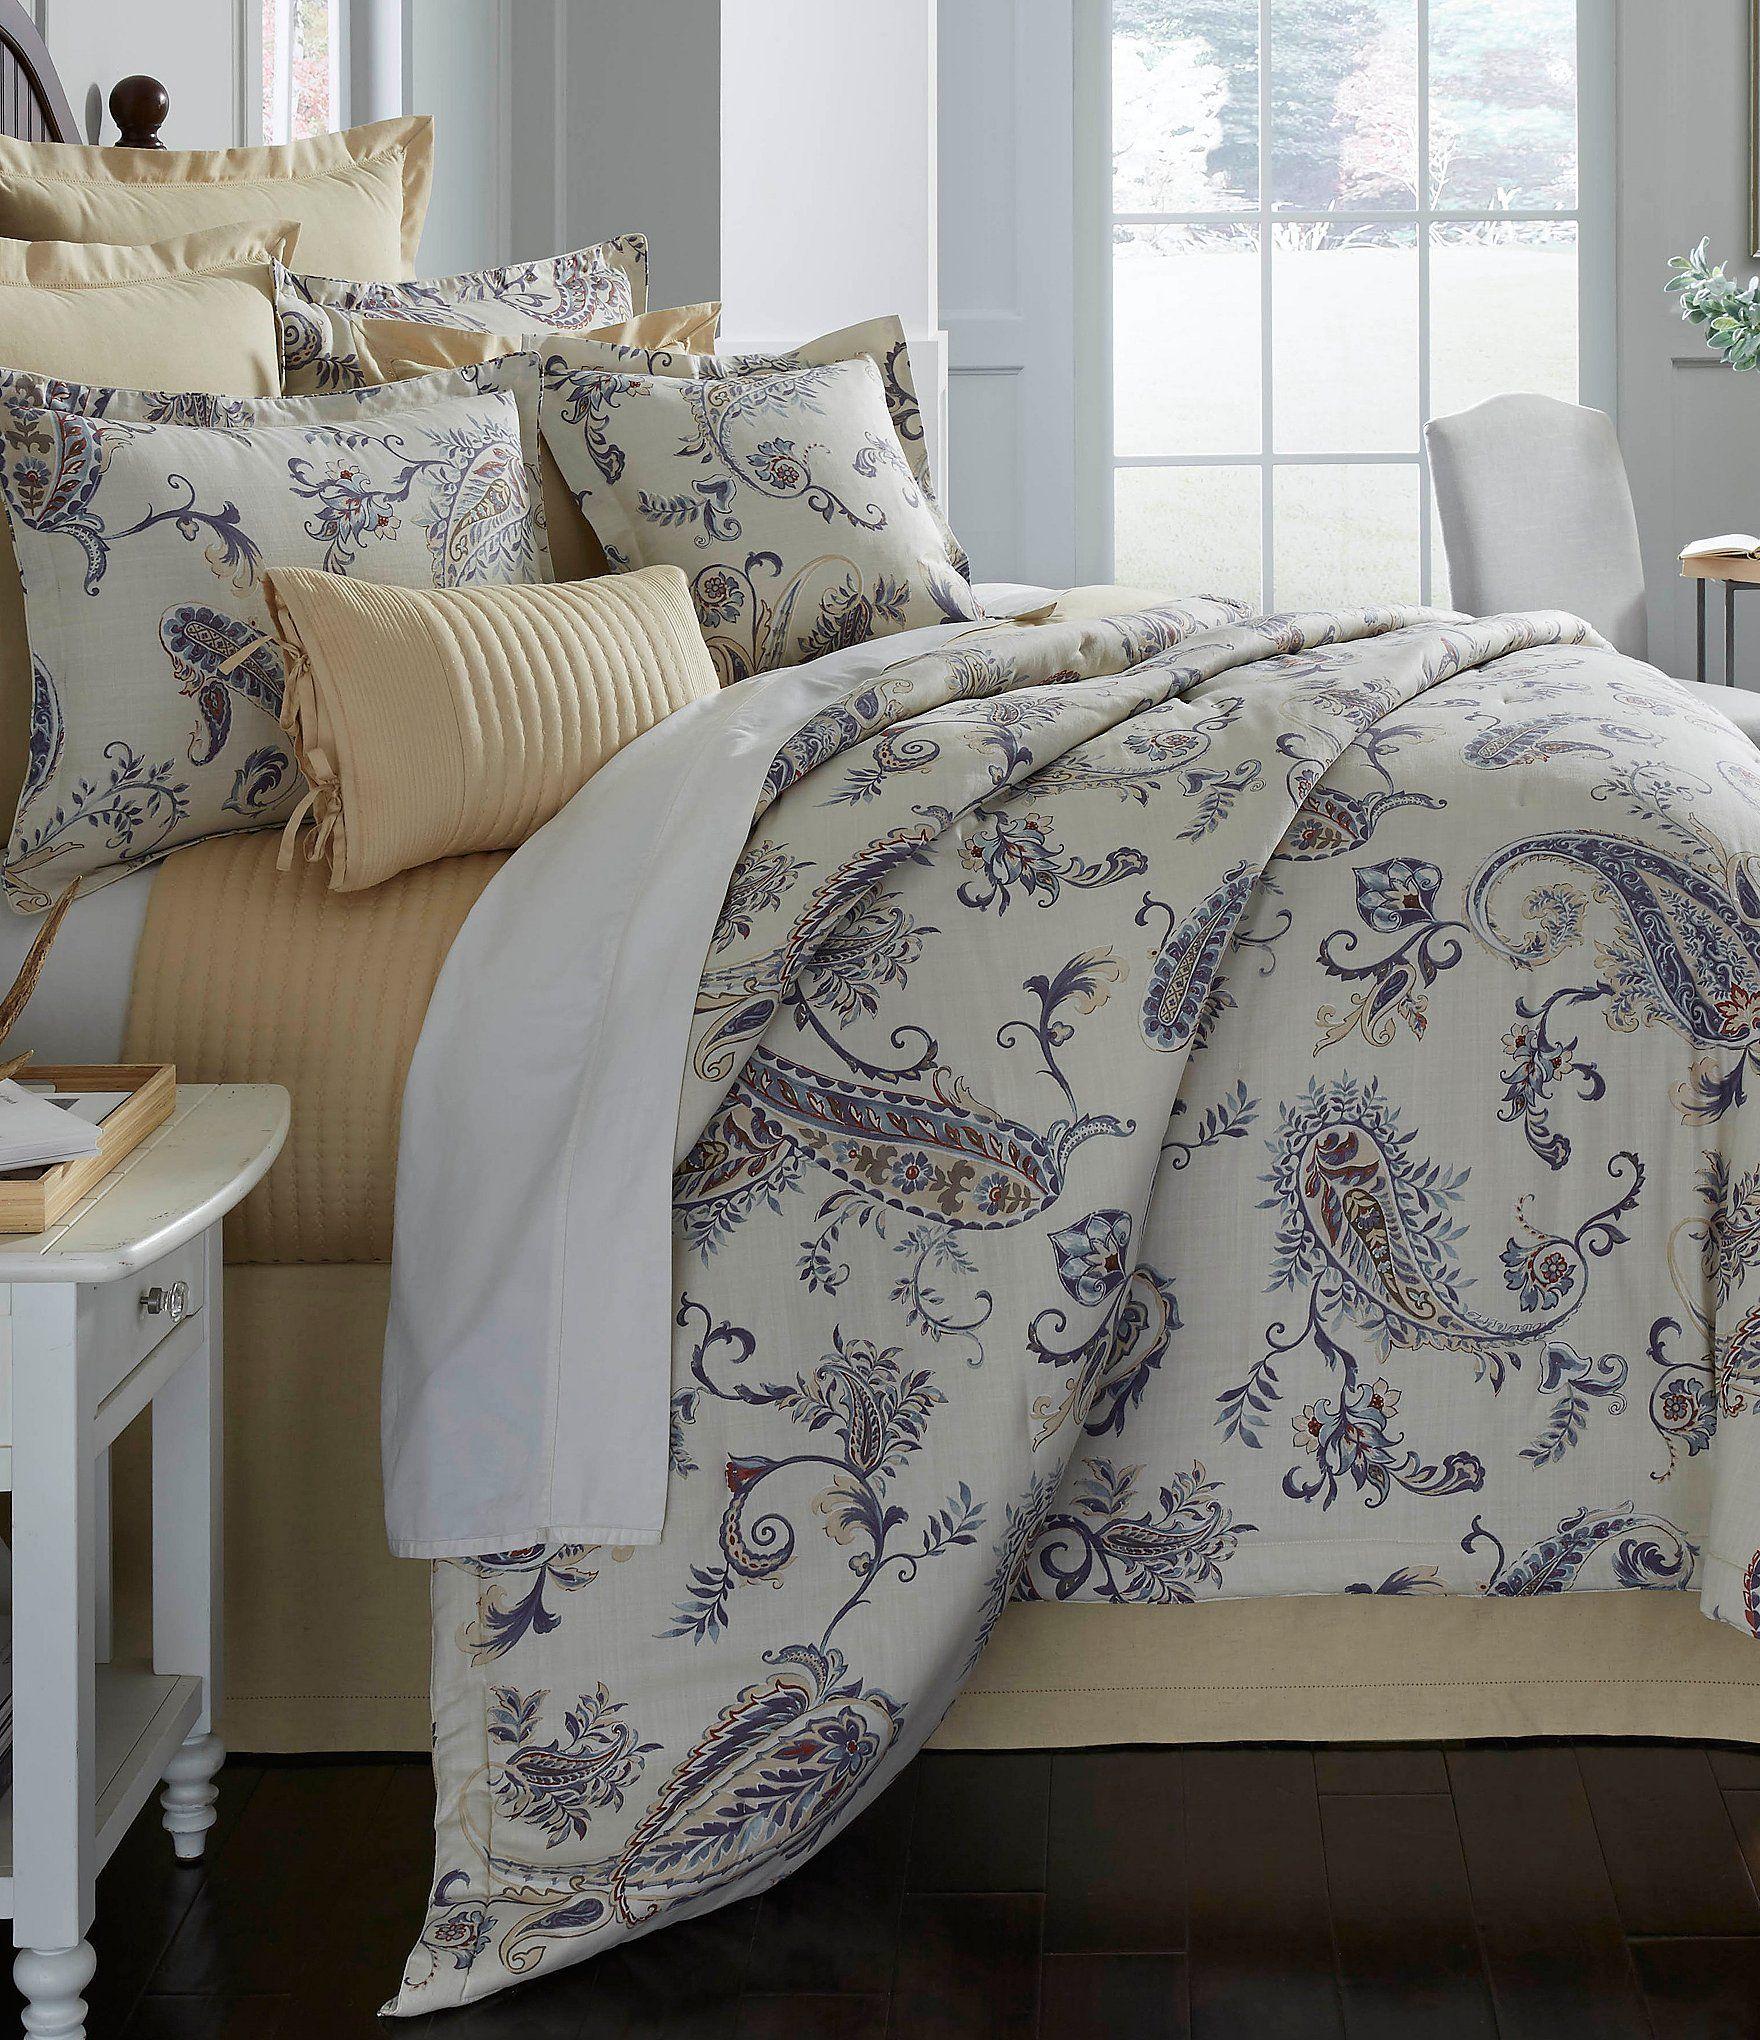 Villa By Noble Excellence Capella Paisley Comforter Mini Set #Dillards